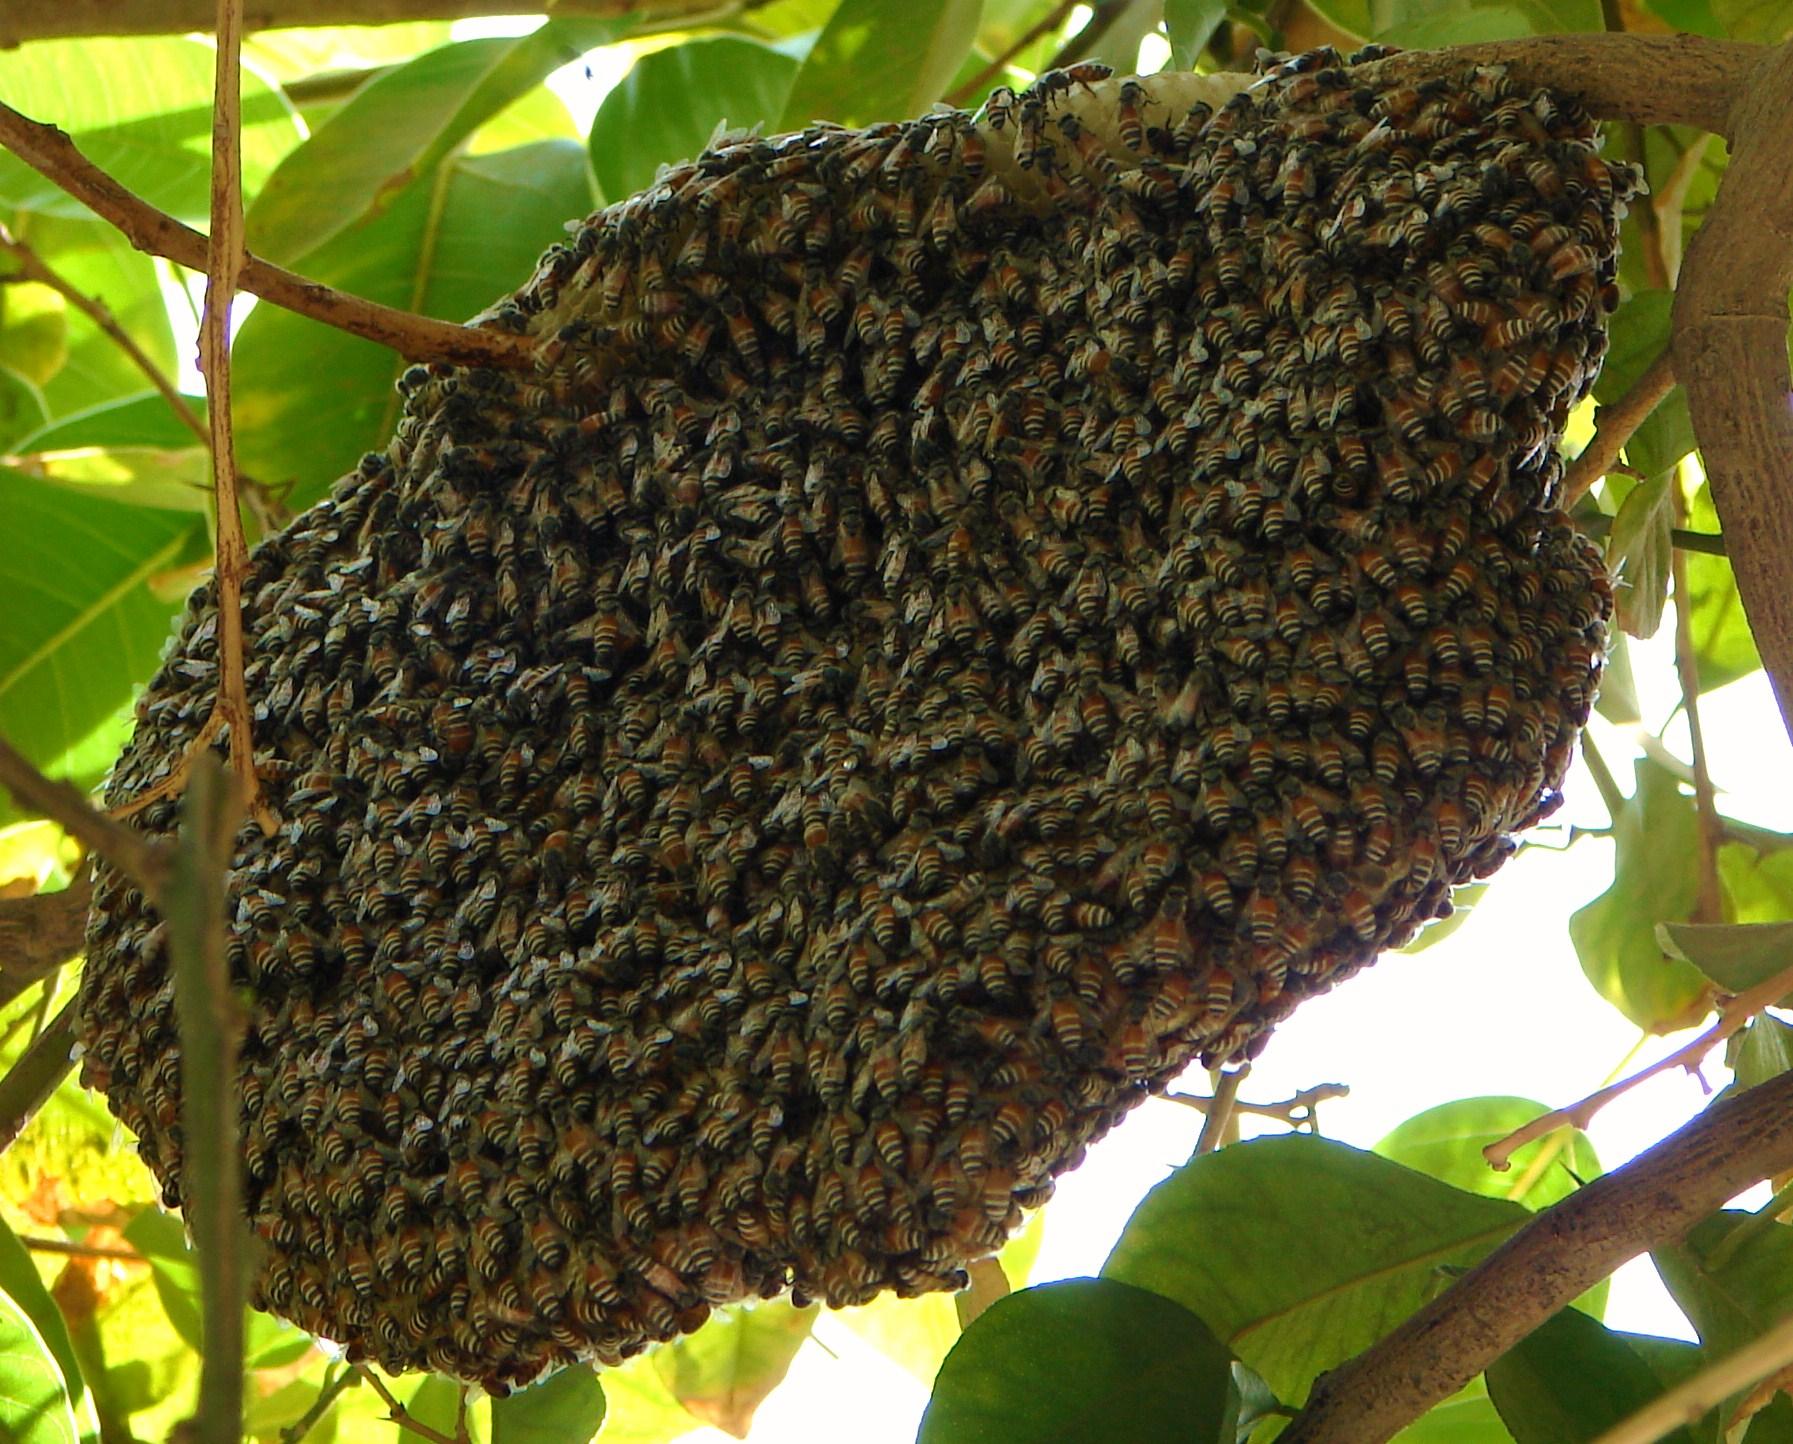 Beehive - photo#3